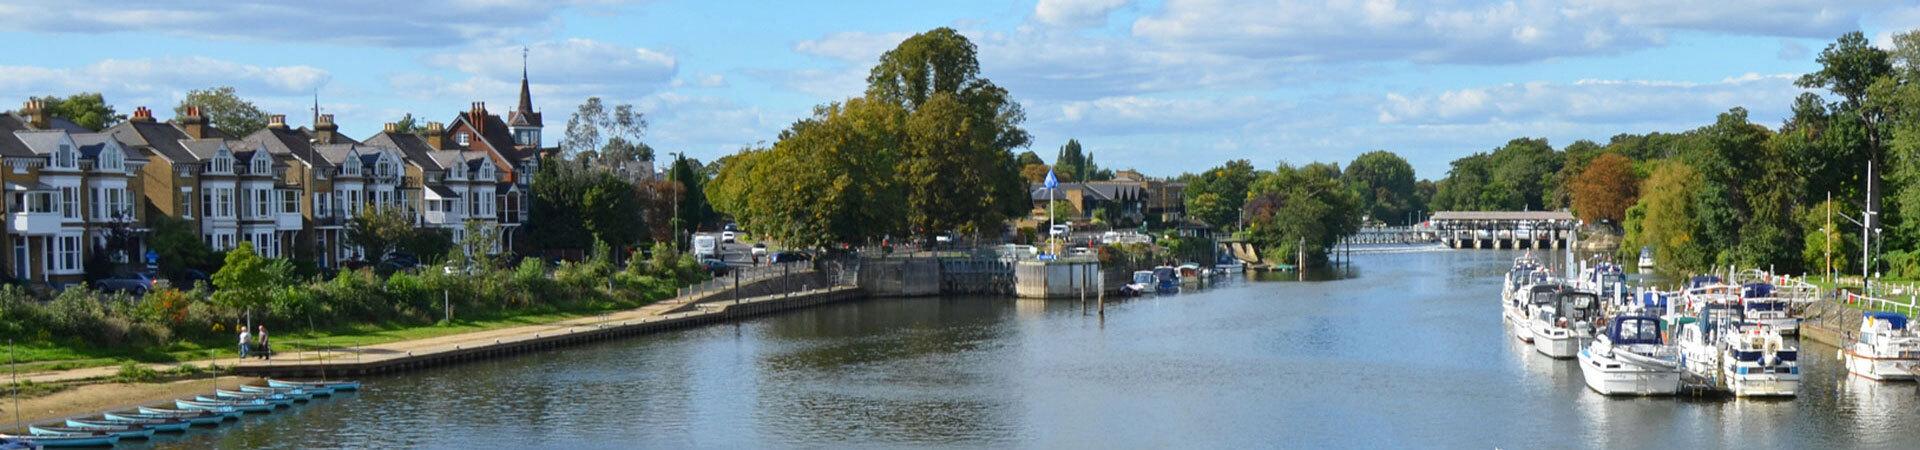 Renting property in Sunbury